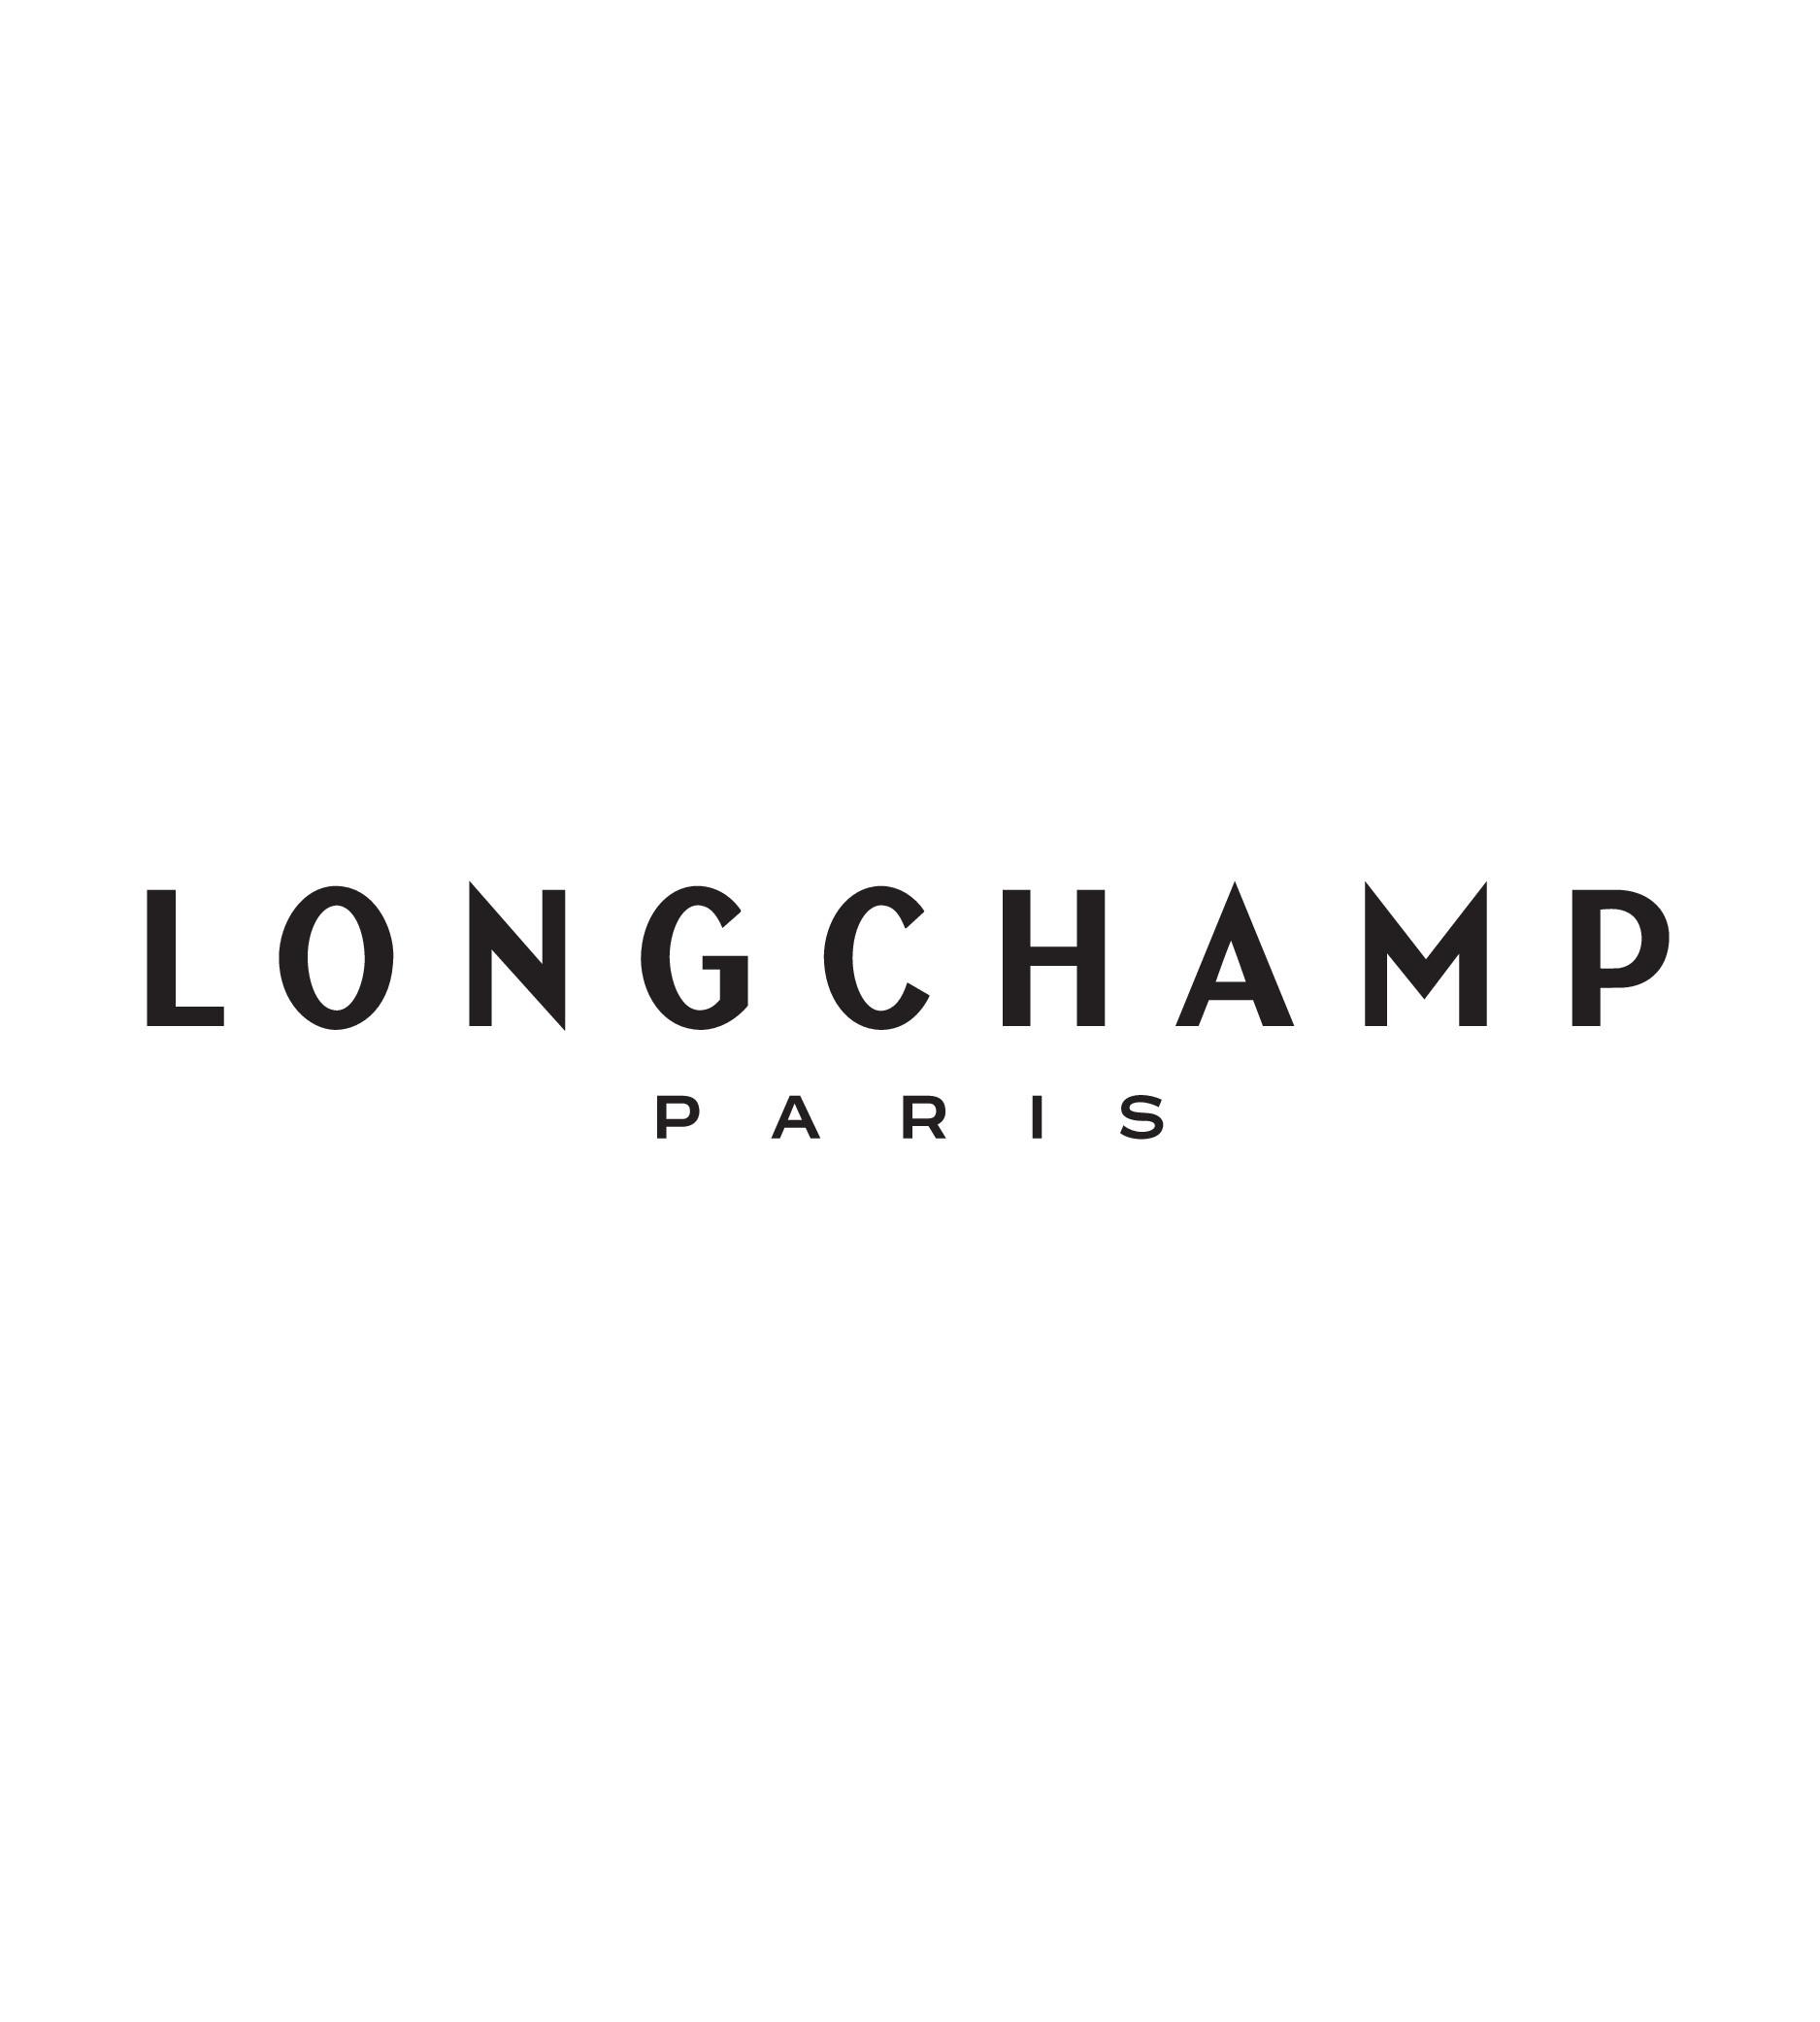 Longchamp Paris Logo